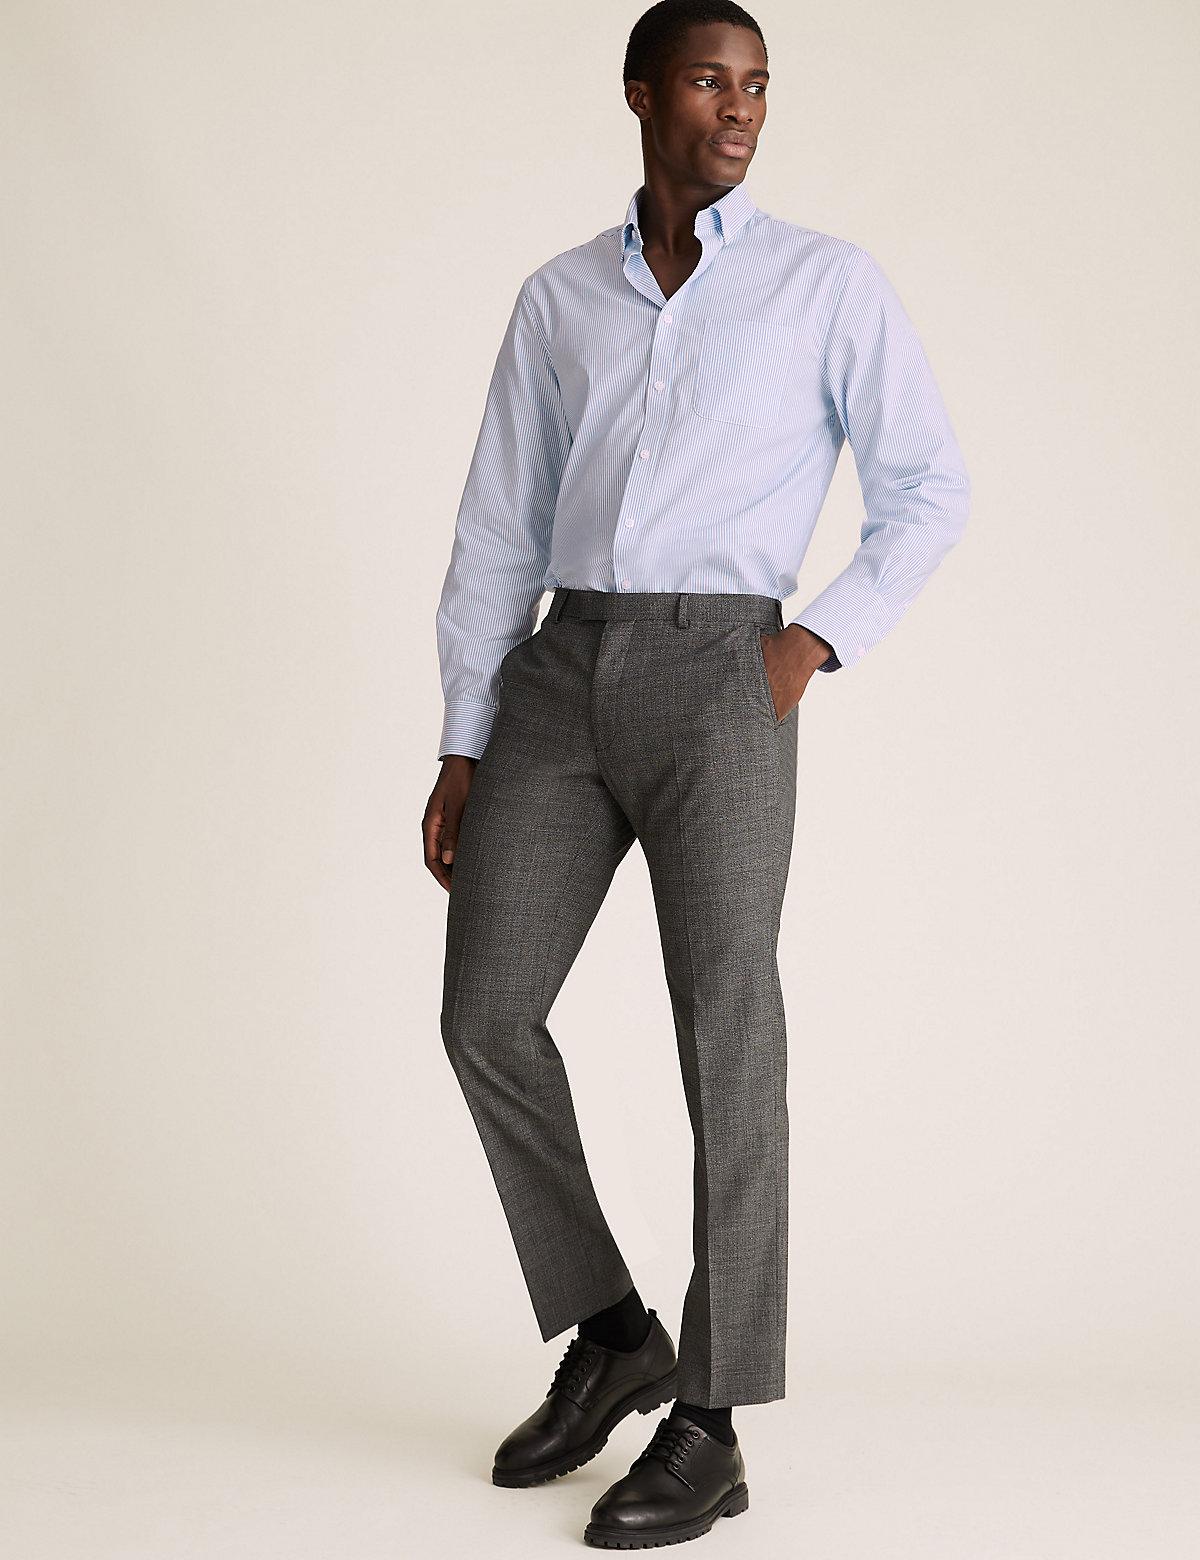 Хлопковые рубашки Oxford стандартного кроя (2 шт)